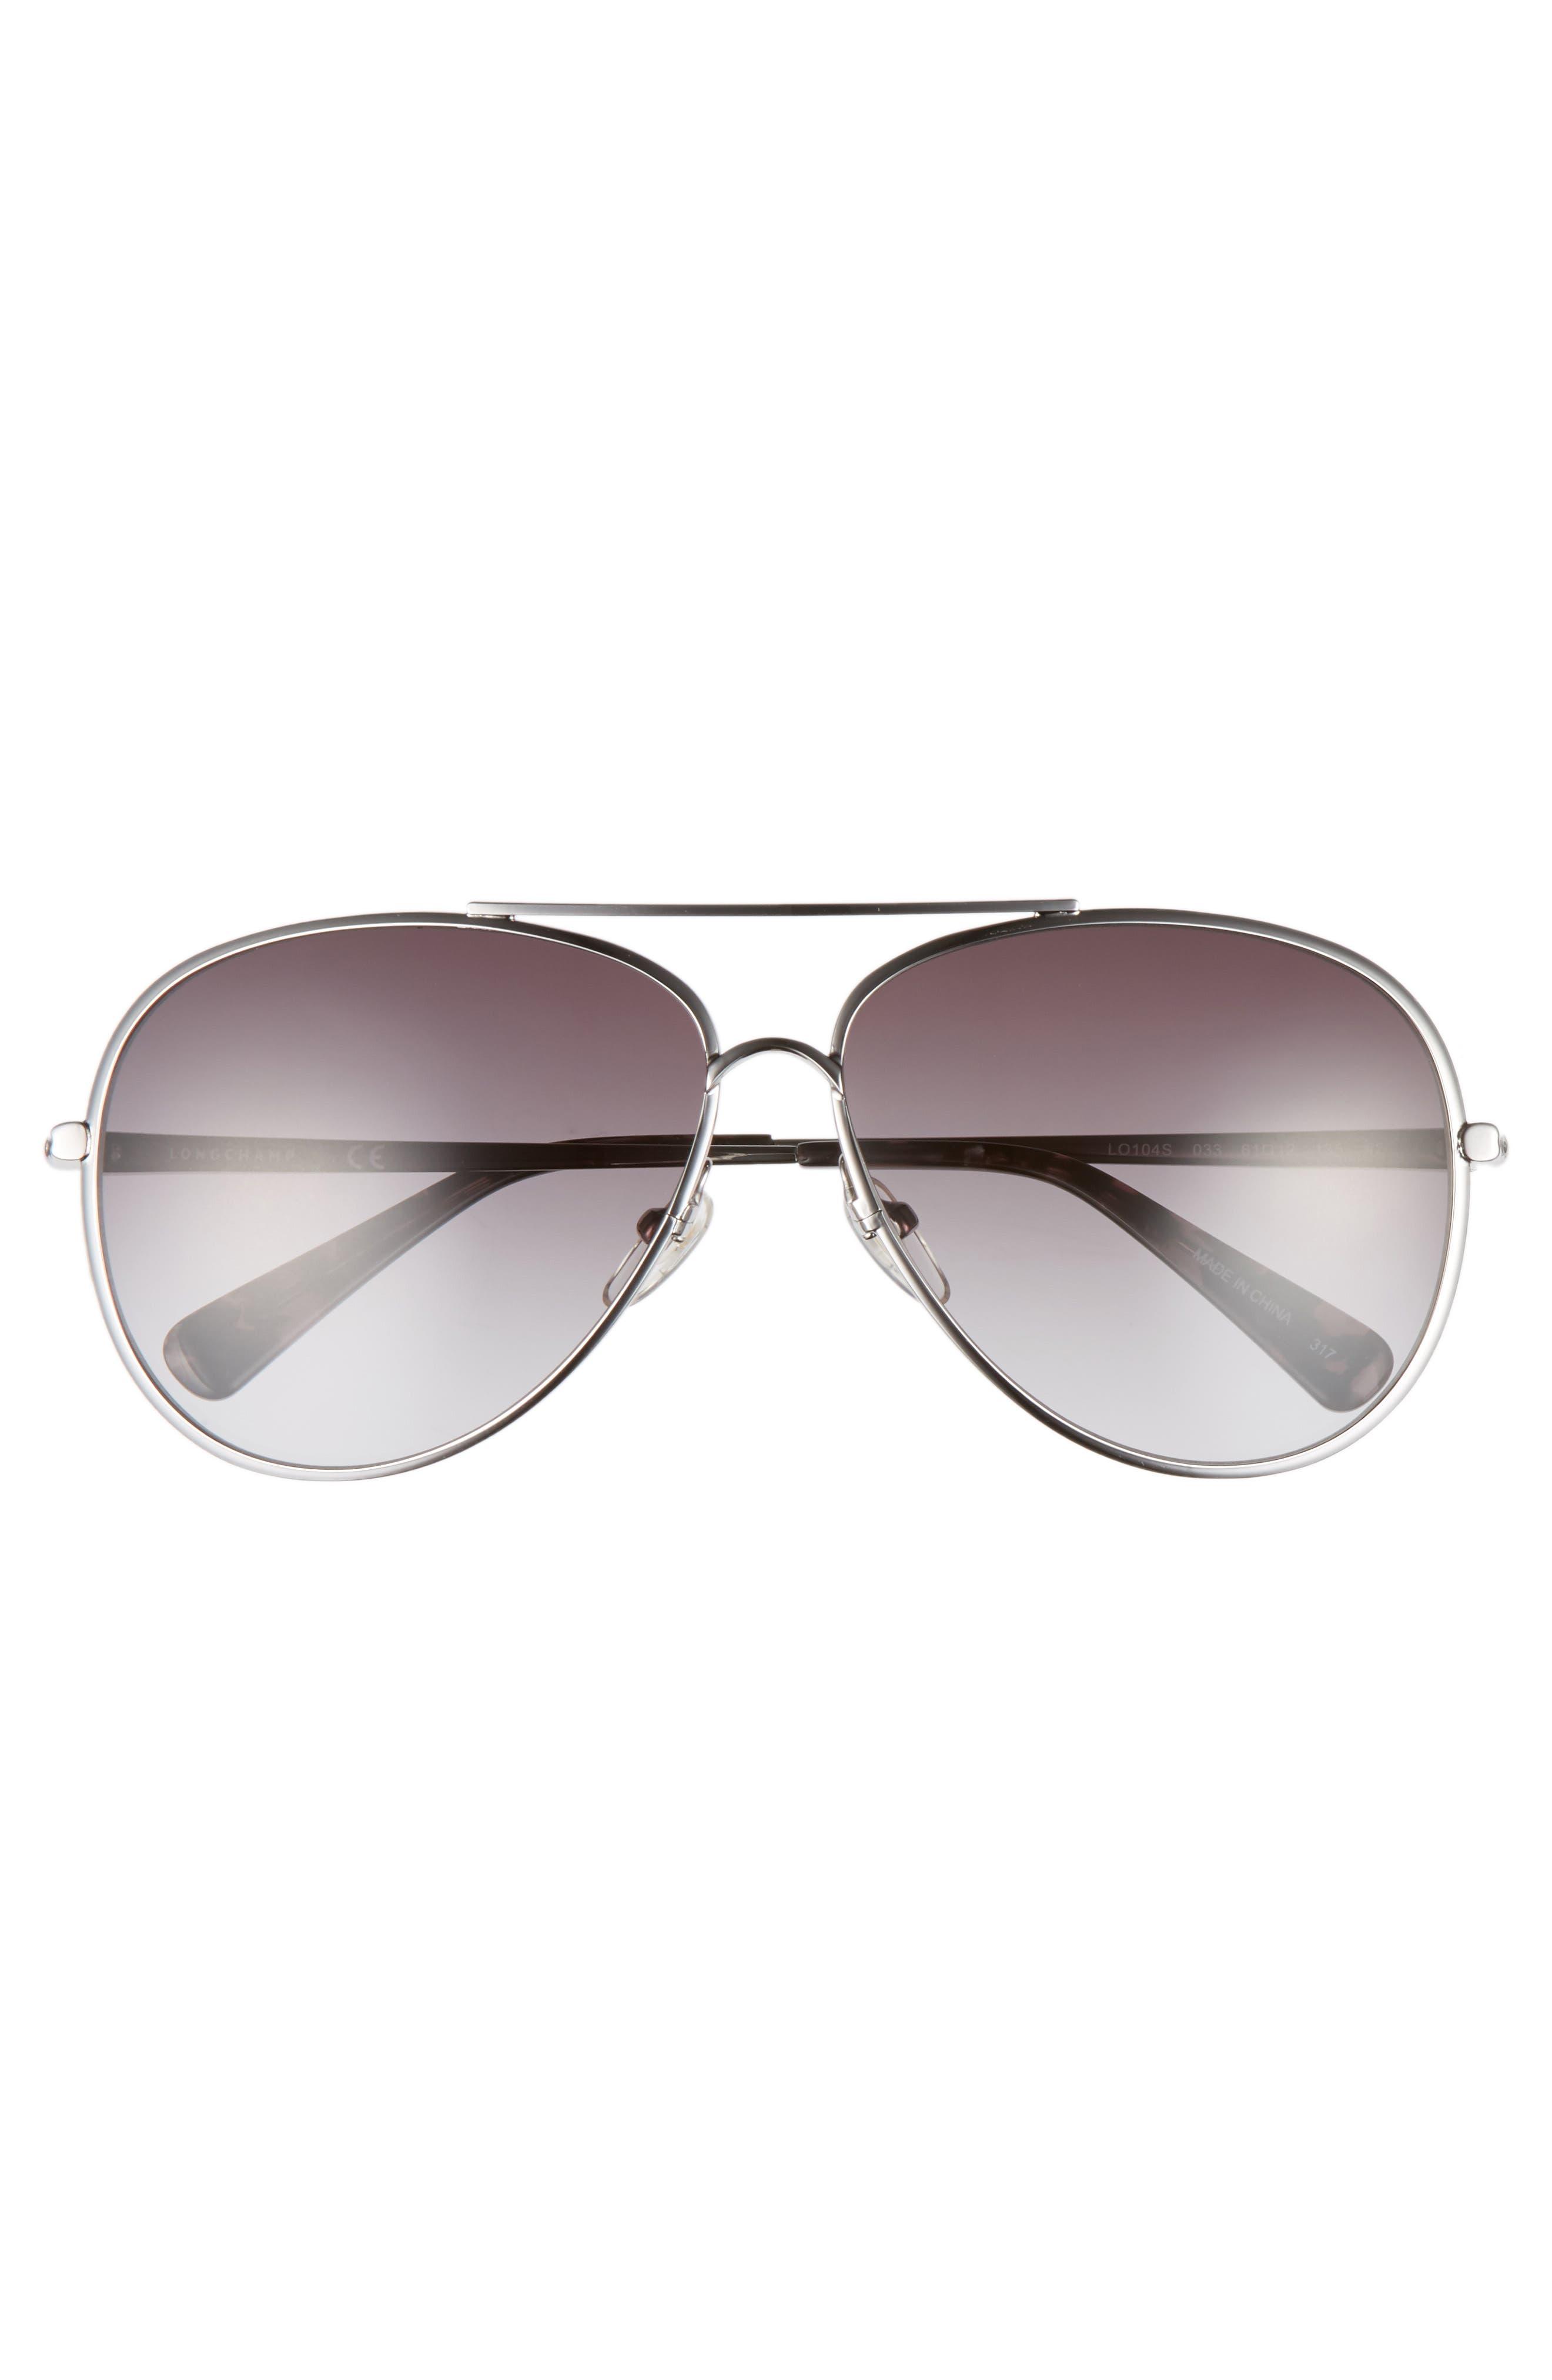 61mm Gradient Lens Aviator Sunglasses,                             Alternate thumbnail 3, color,                             033